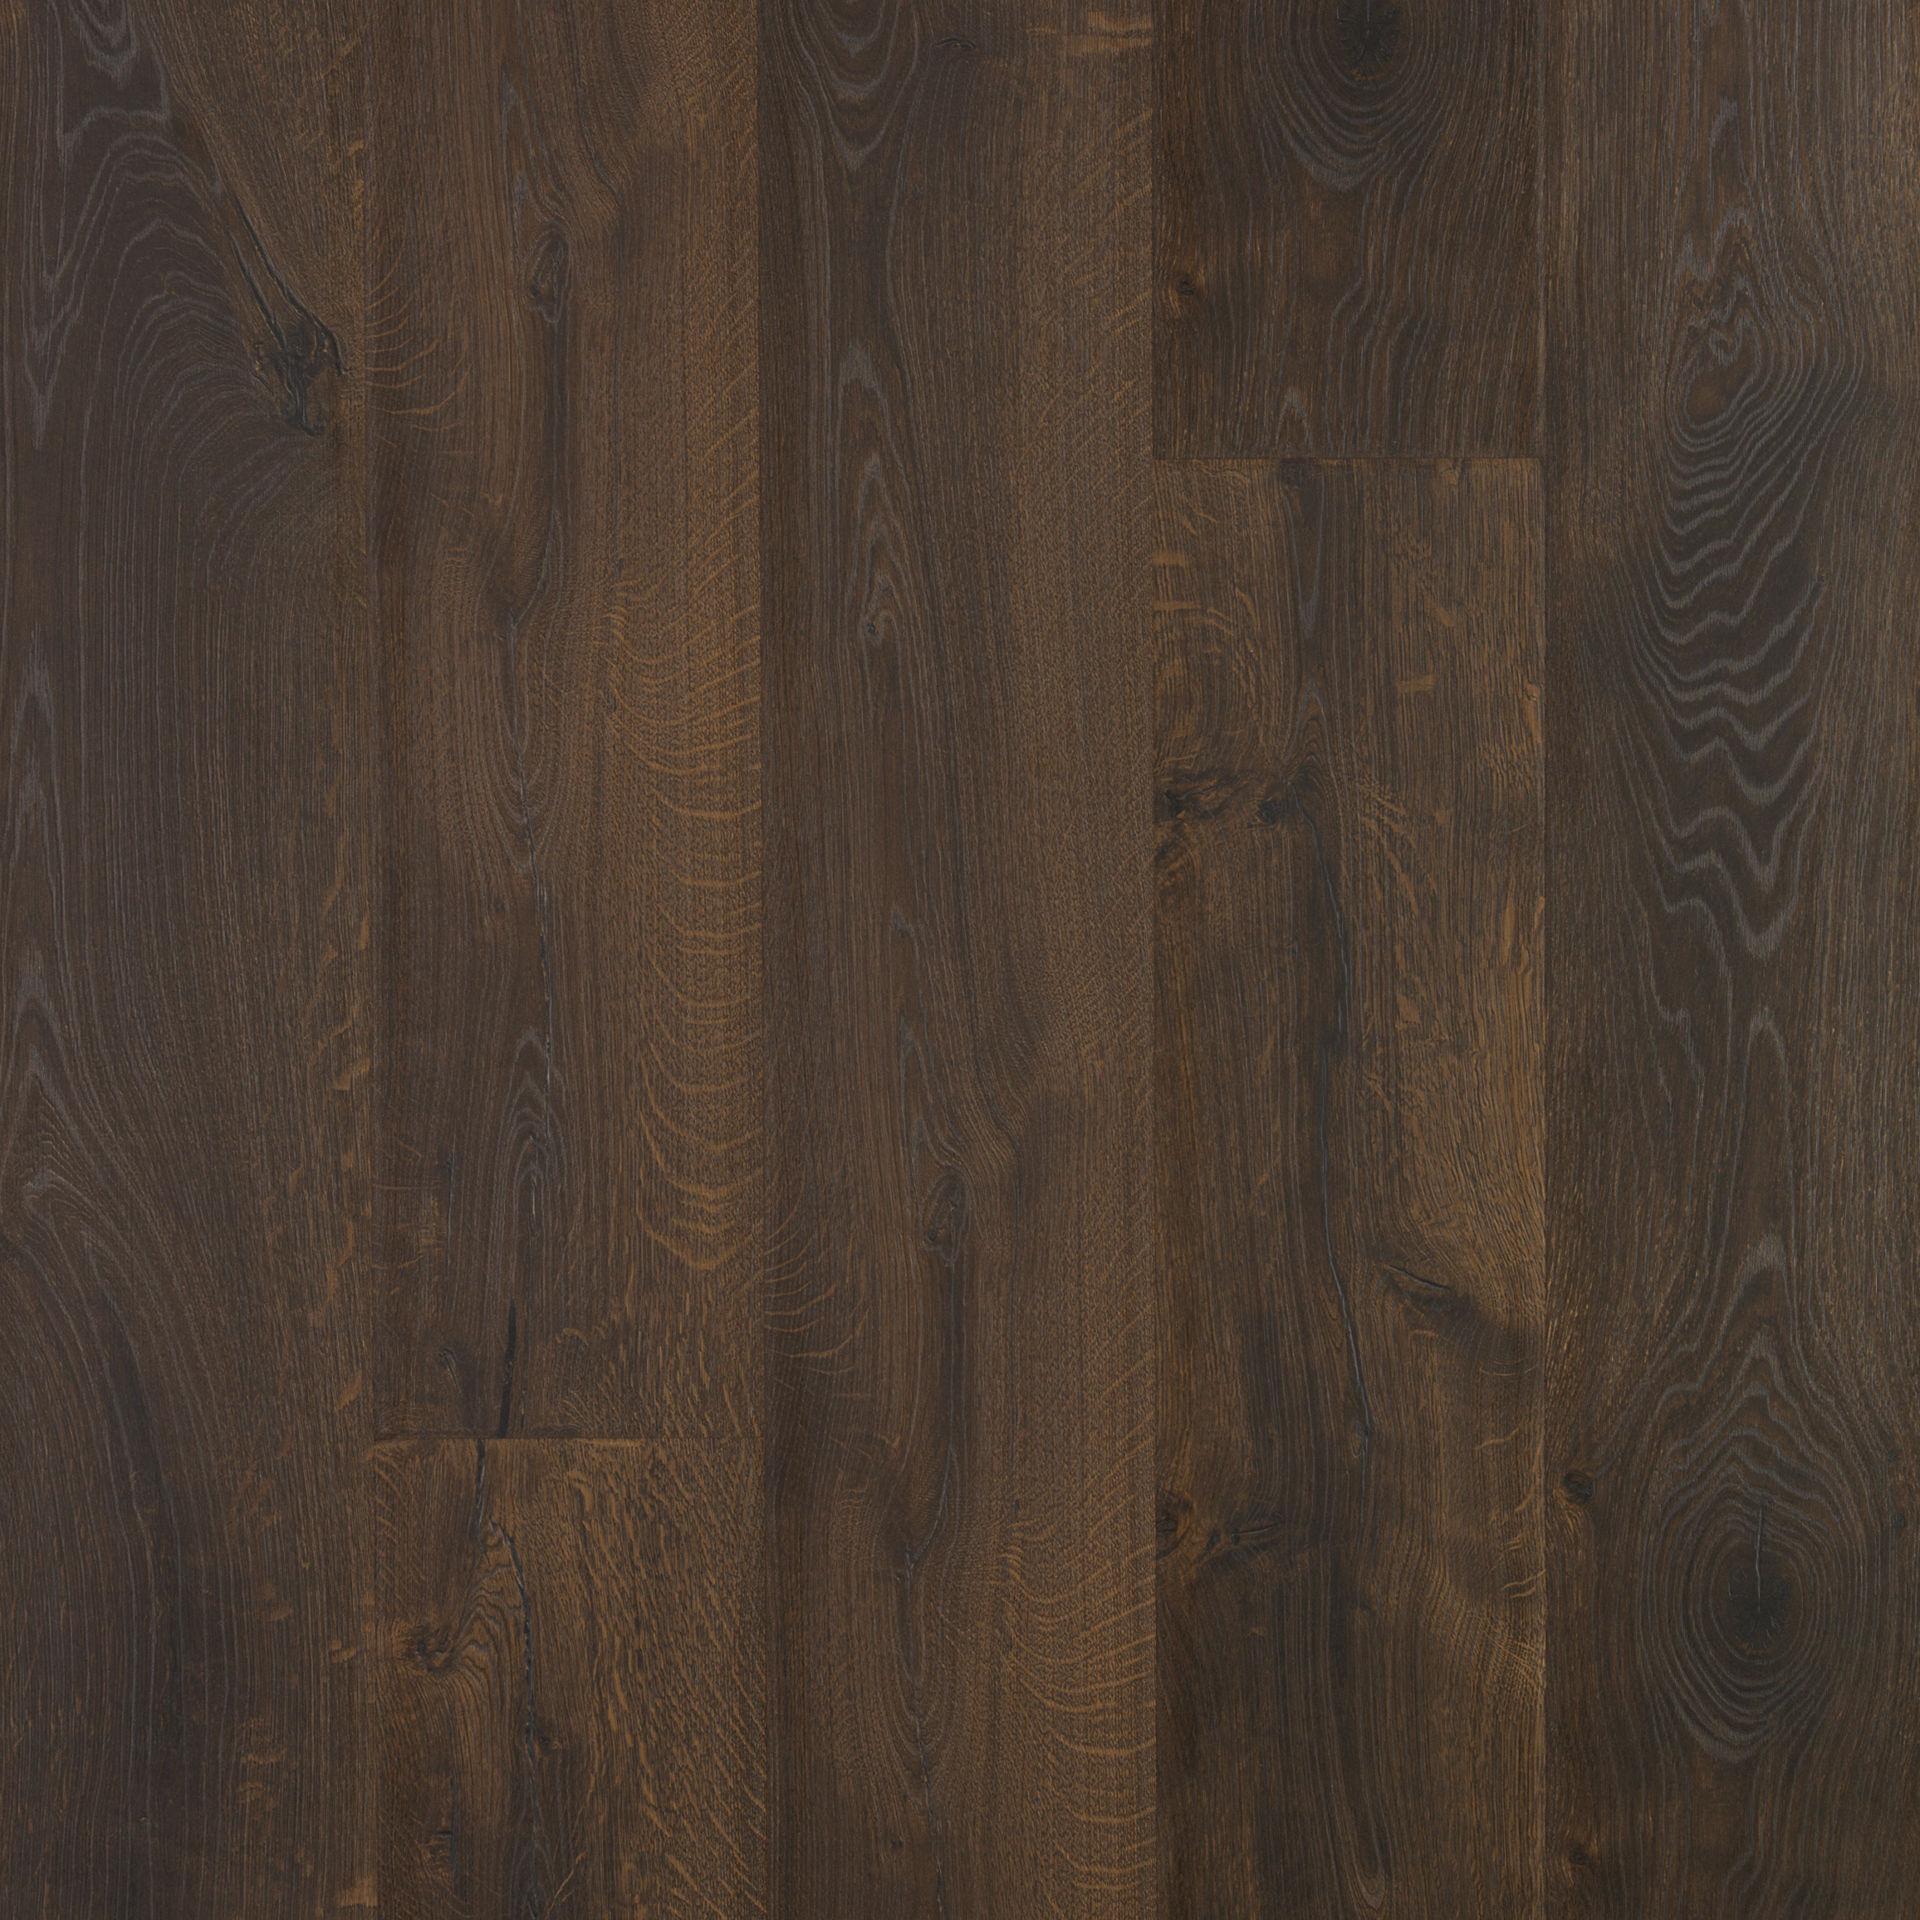 Quickstep Snyder Oak Buy Laminate Flooring Online